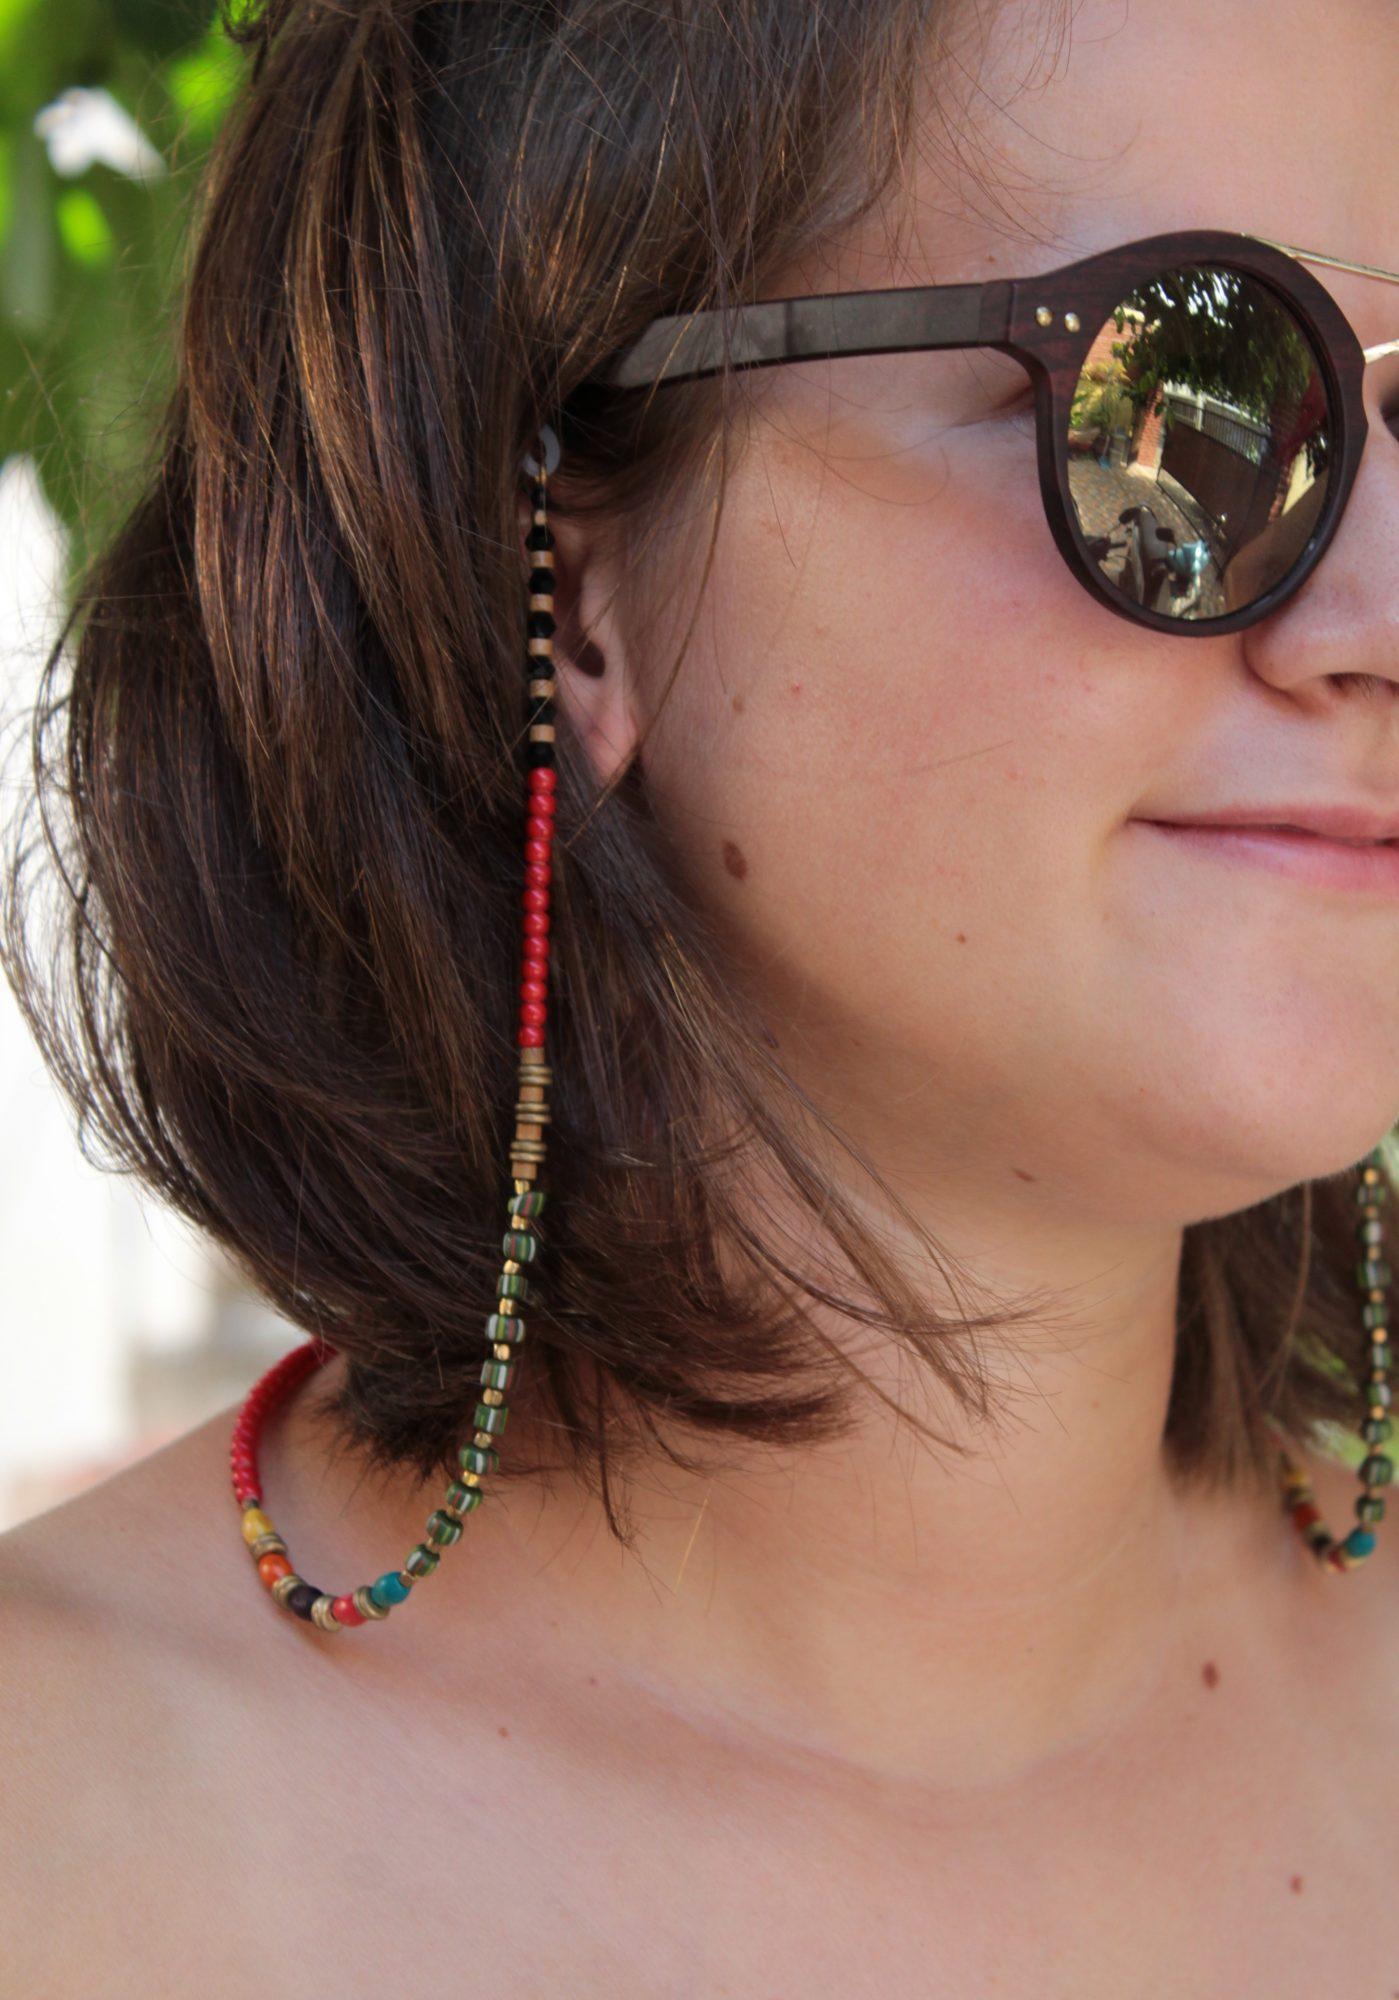 Brillenband Bunt Sommer Schmuck Accessoire